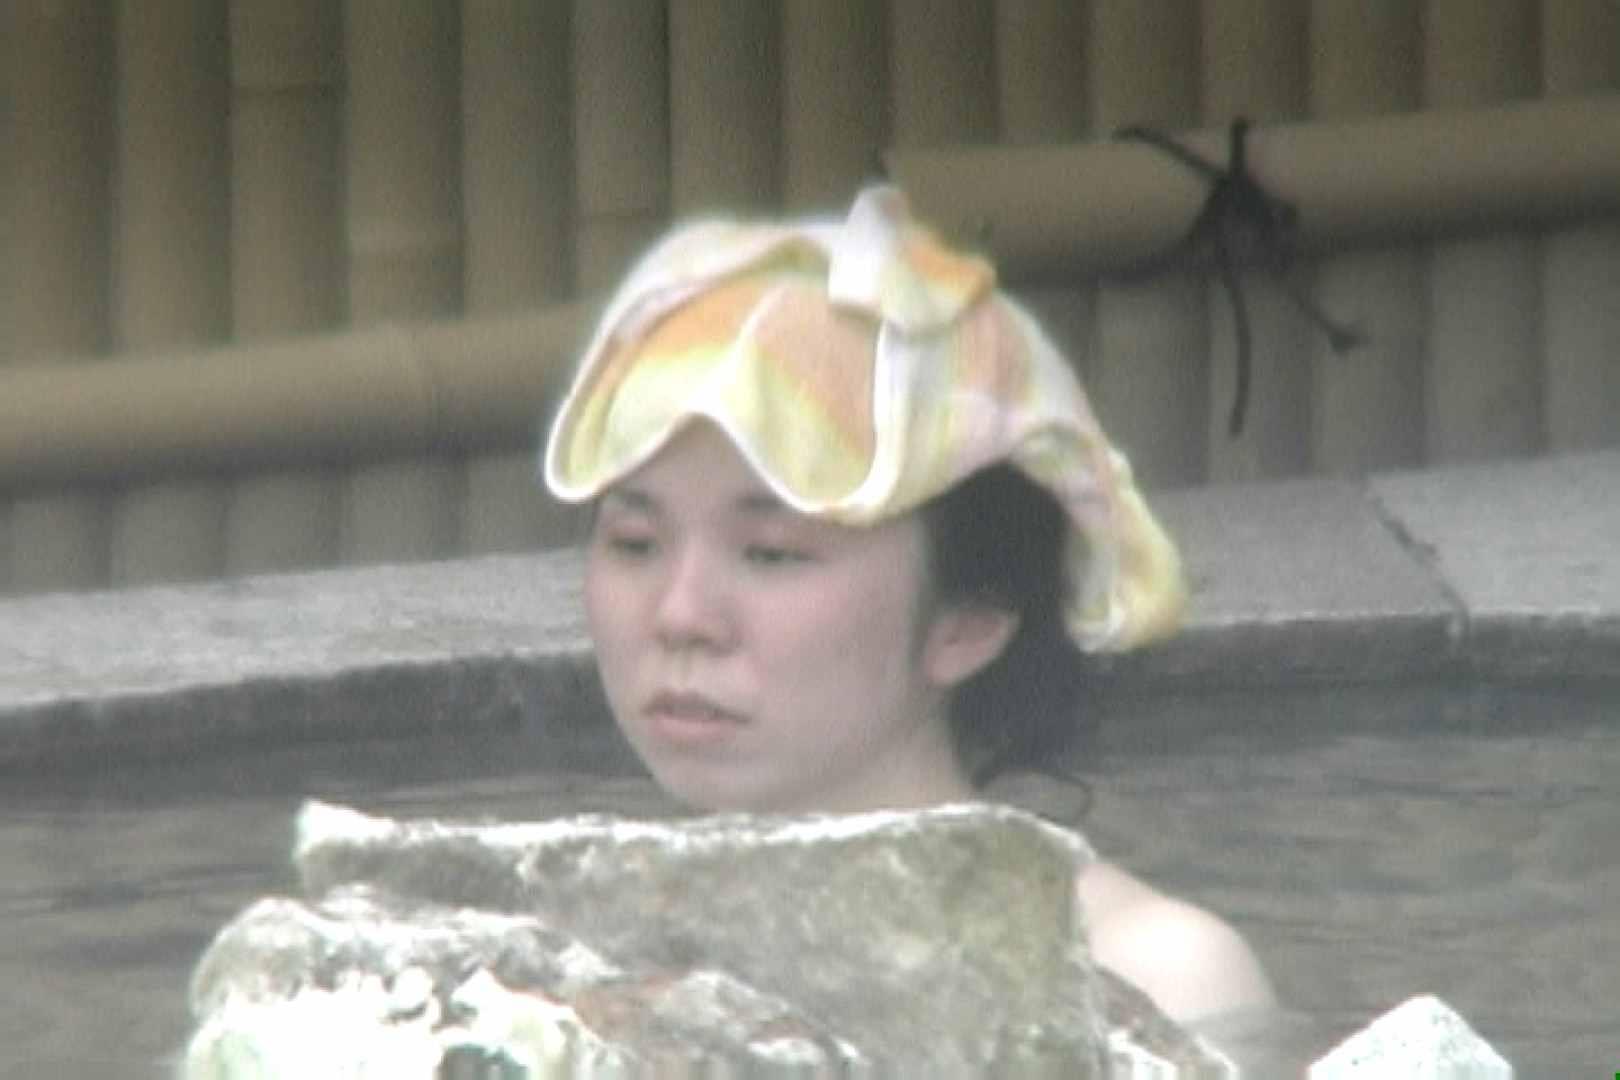 Aquaな露天風呂Vol.687 露天 隠し撮りオマンコ動画紹介 63画像 38